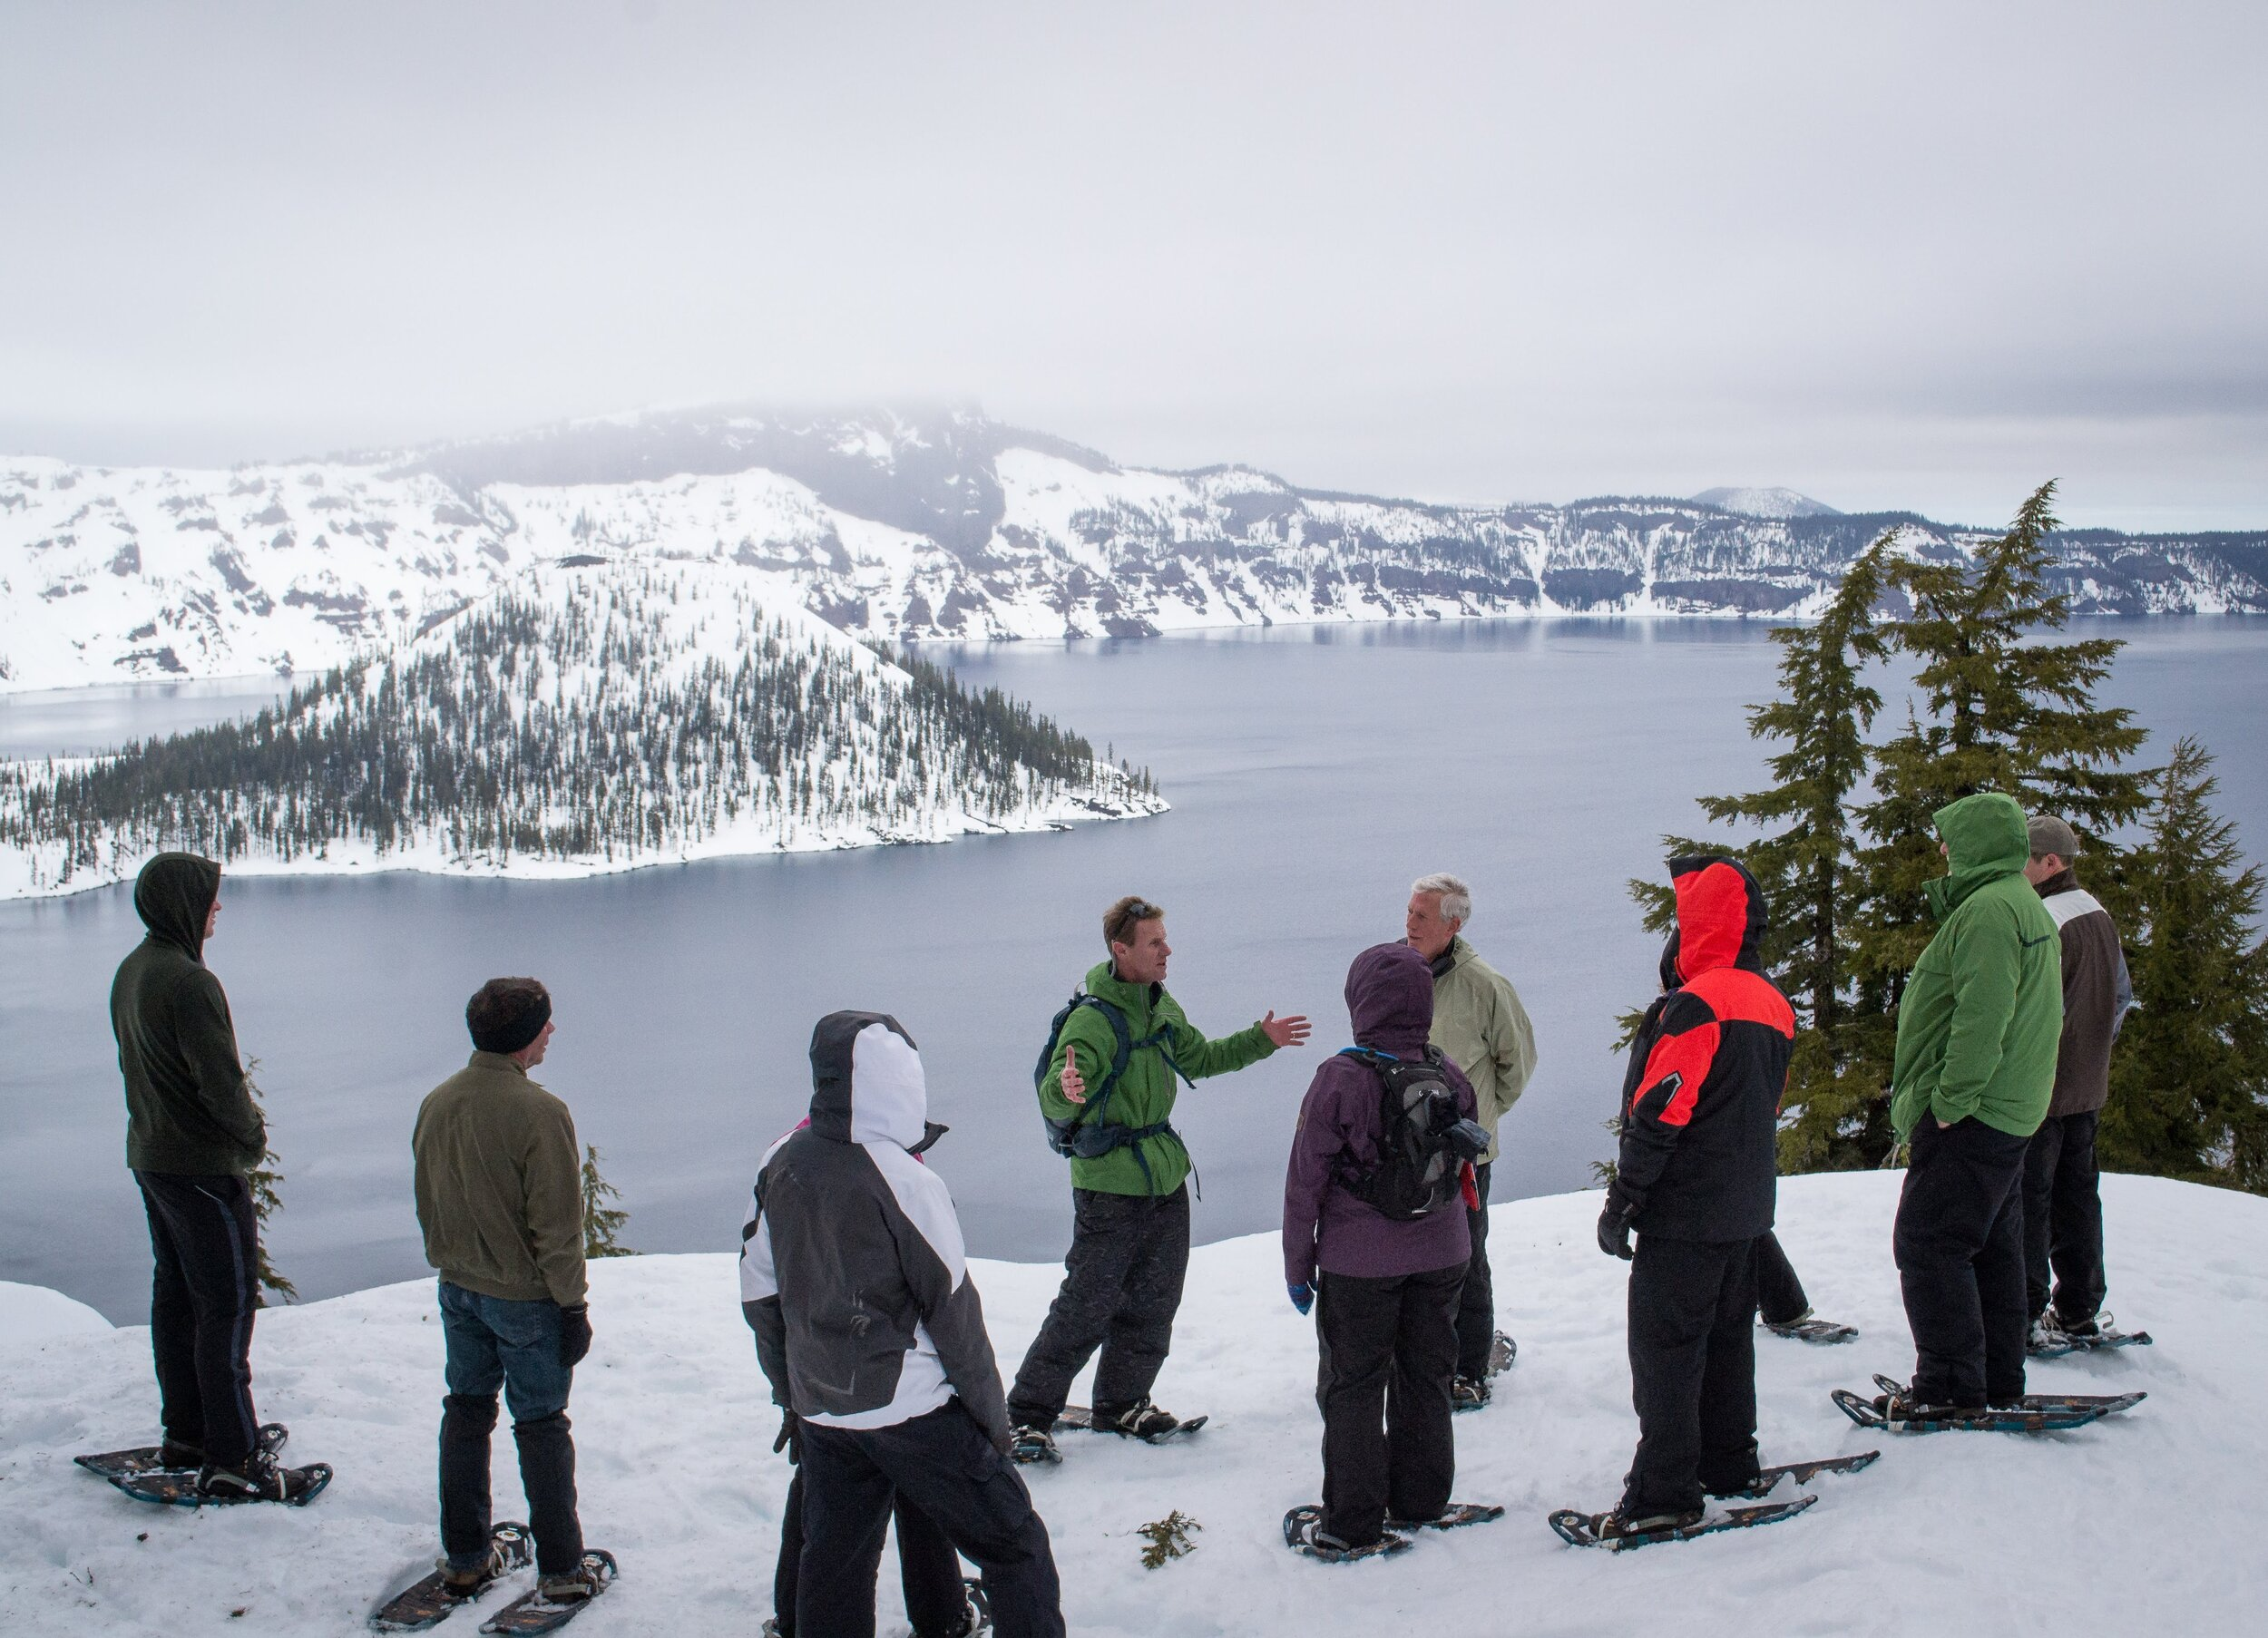 Crater Lake National Park - Oregon - Summer - Winter - Wanderlust Tours